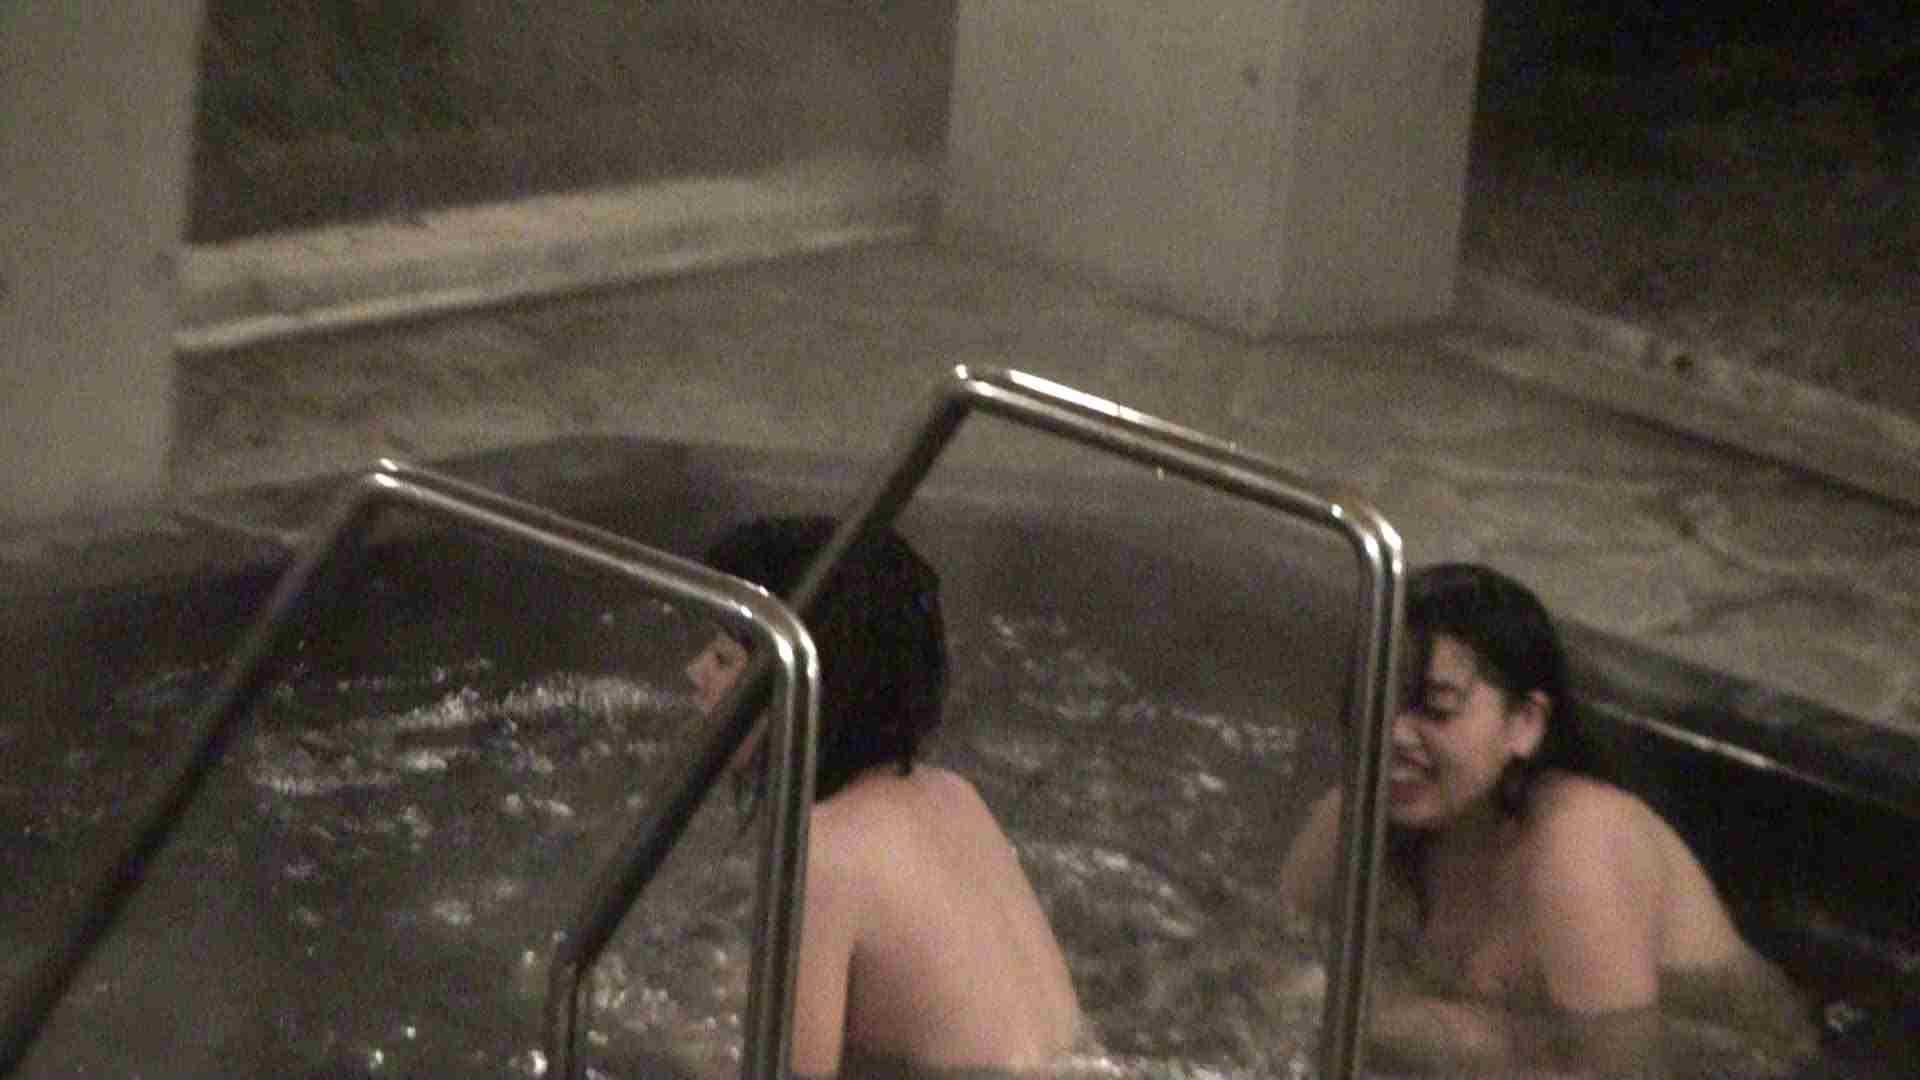 Aquaな露天風呂Vol.405 女体盗撮 盗撮オマンコ無修正動画無料 86連発 38